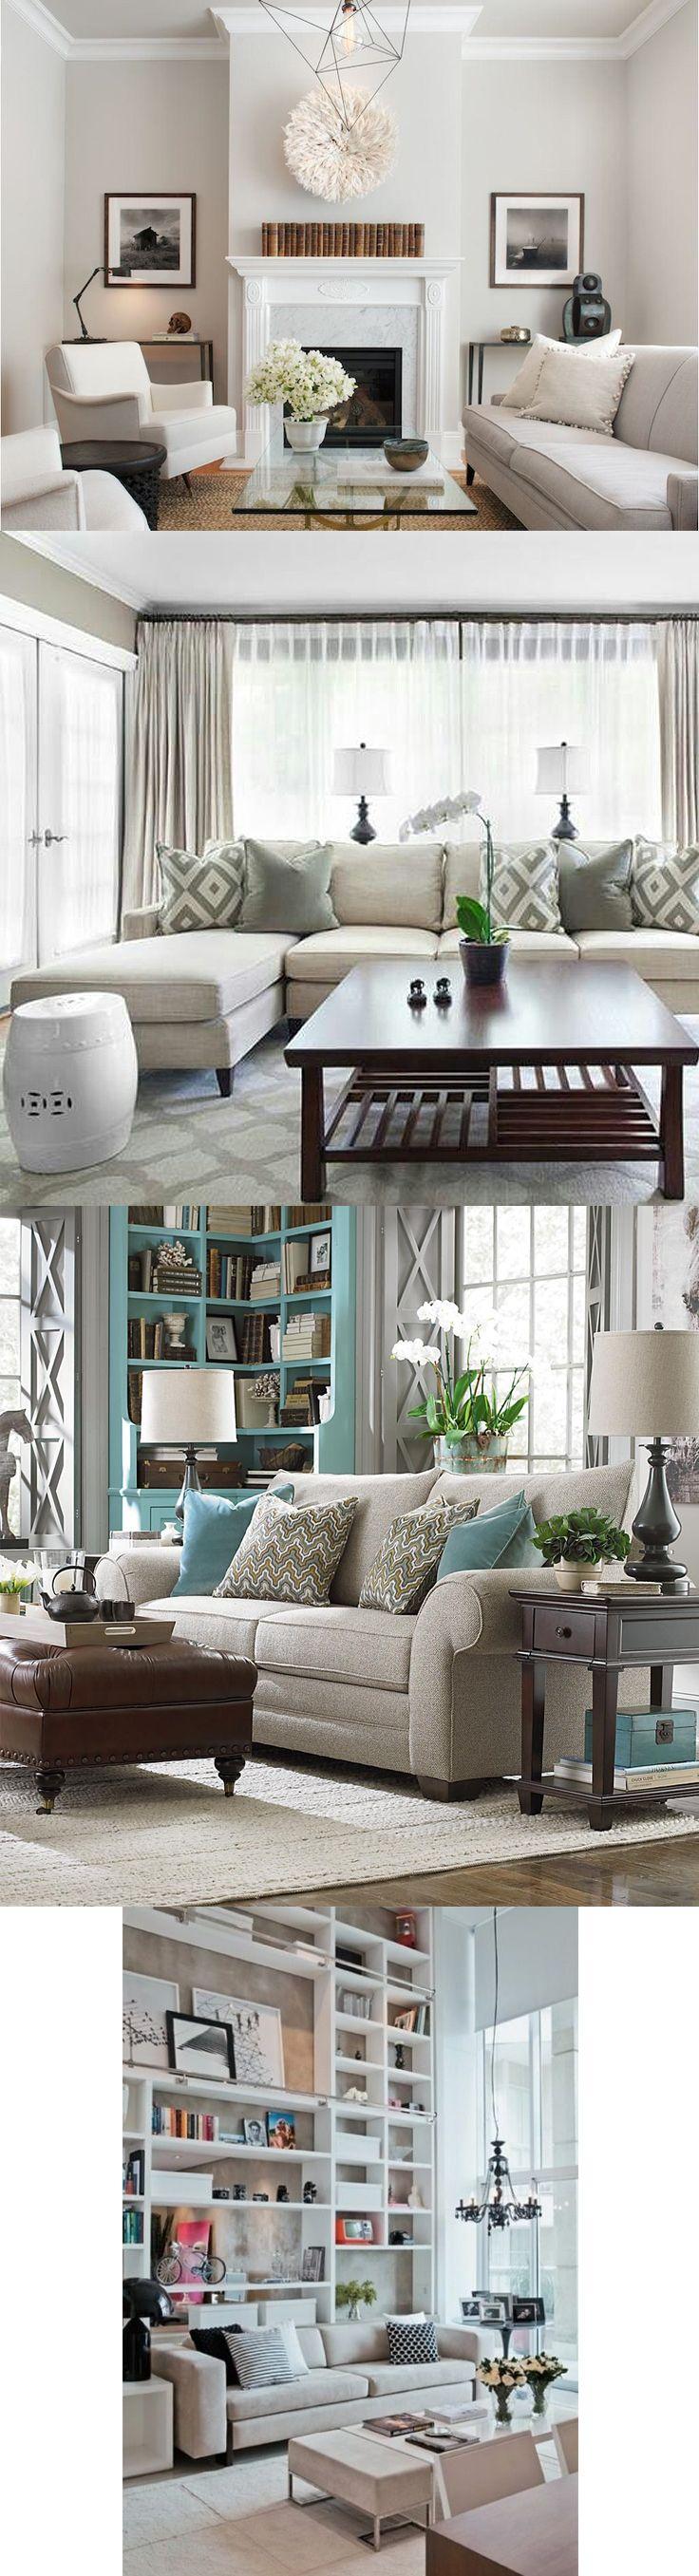 Best 25+ Cream sofa ideas on Pinterest | Cream couch, Living room ...